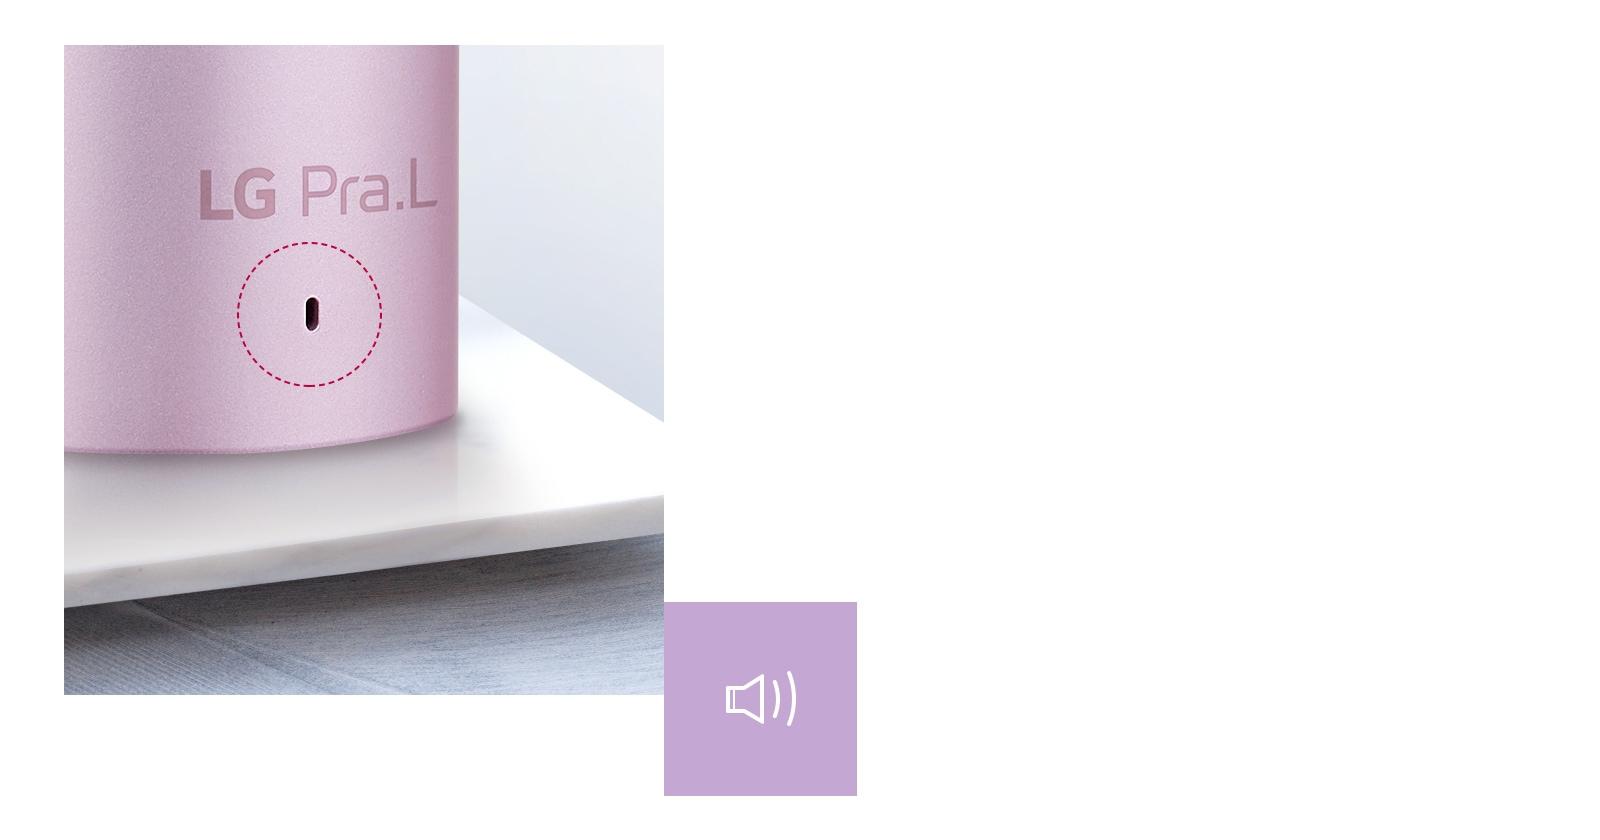 HK_Pink_BLJ1_liftupcare_usp_07_22052018